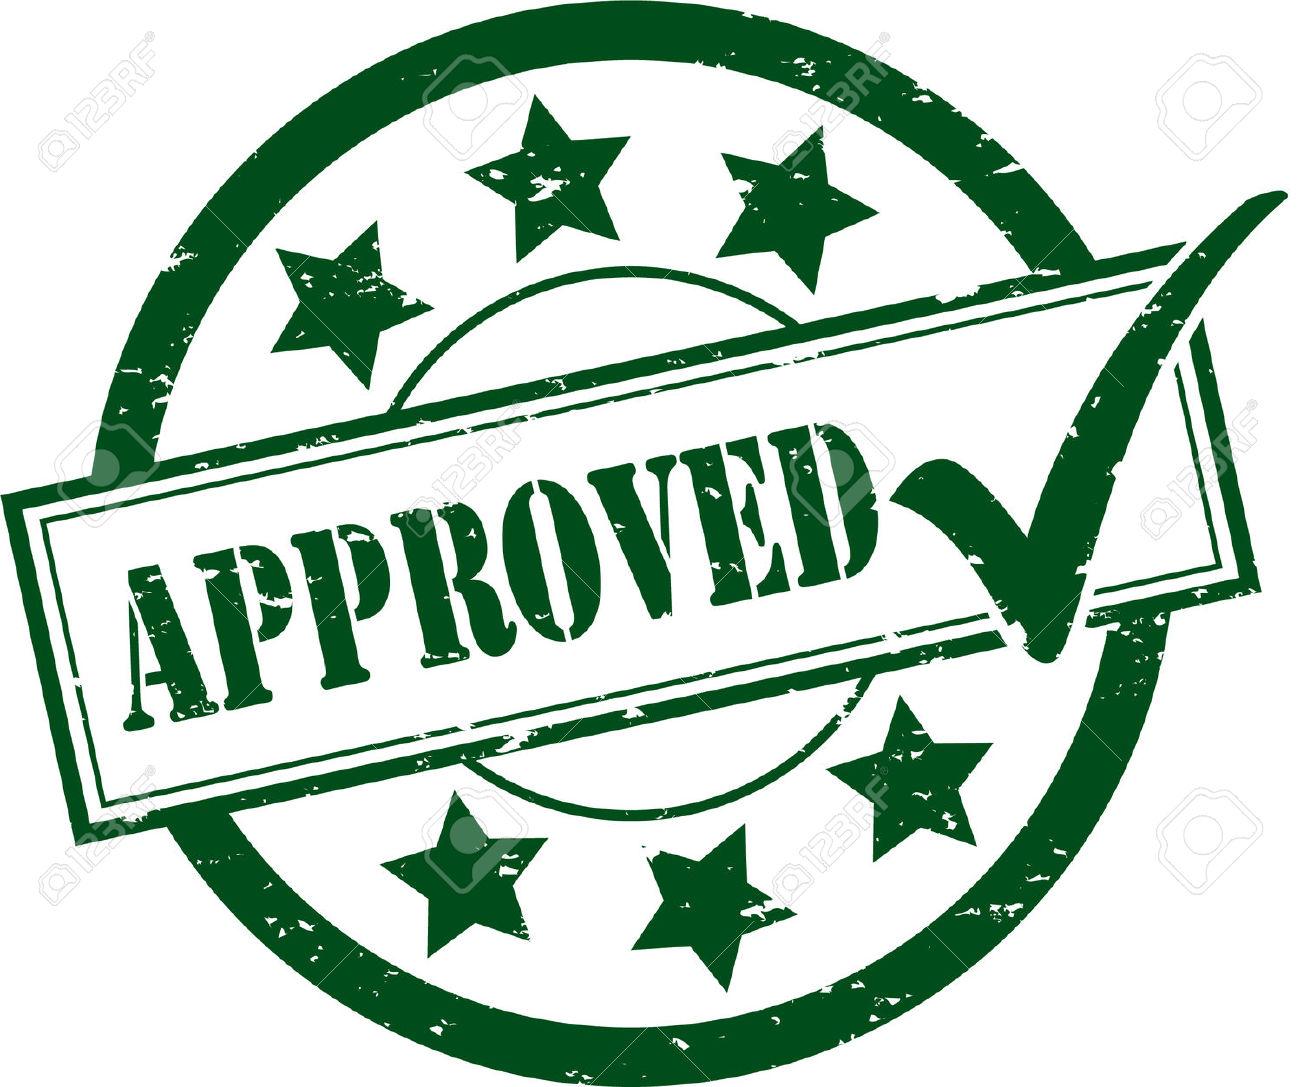 EDU: Approved